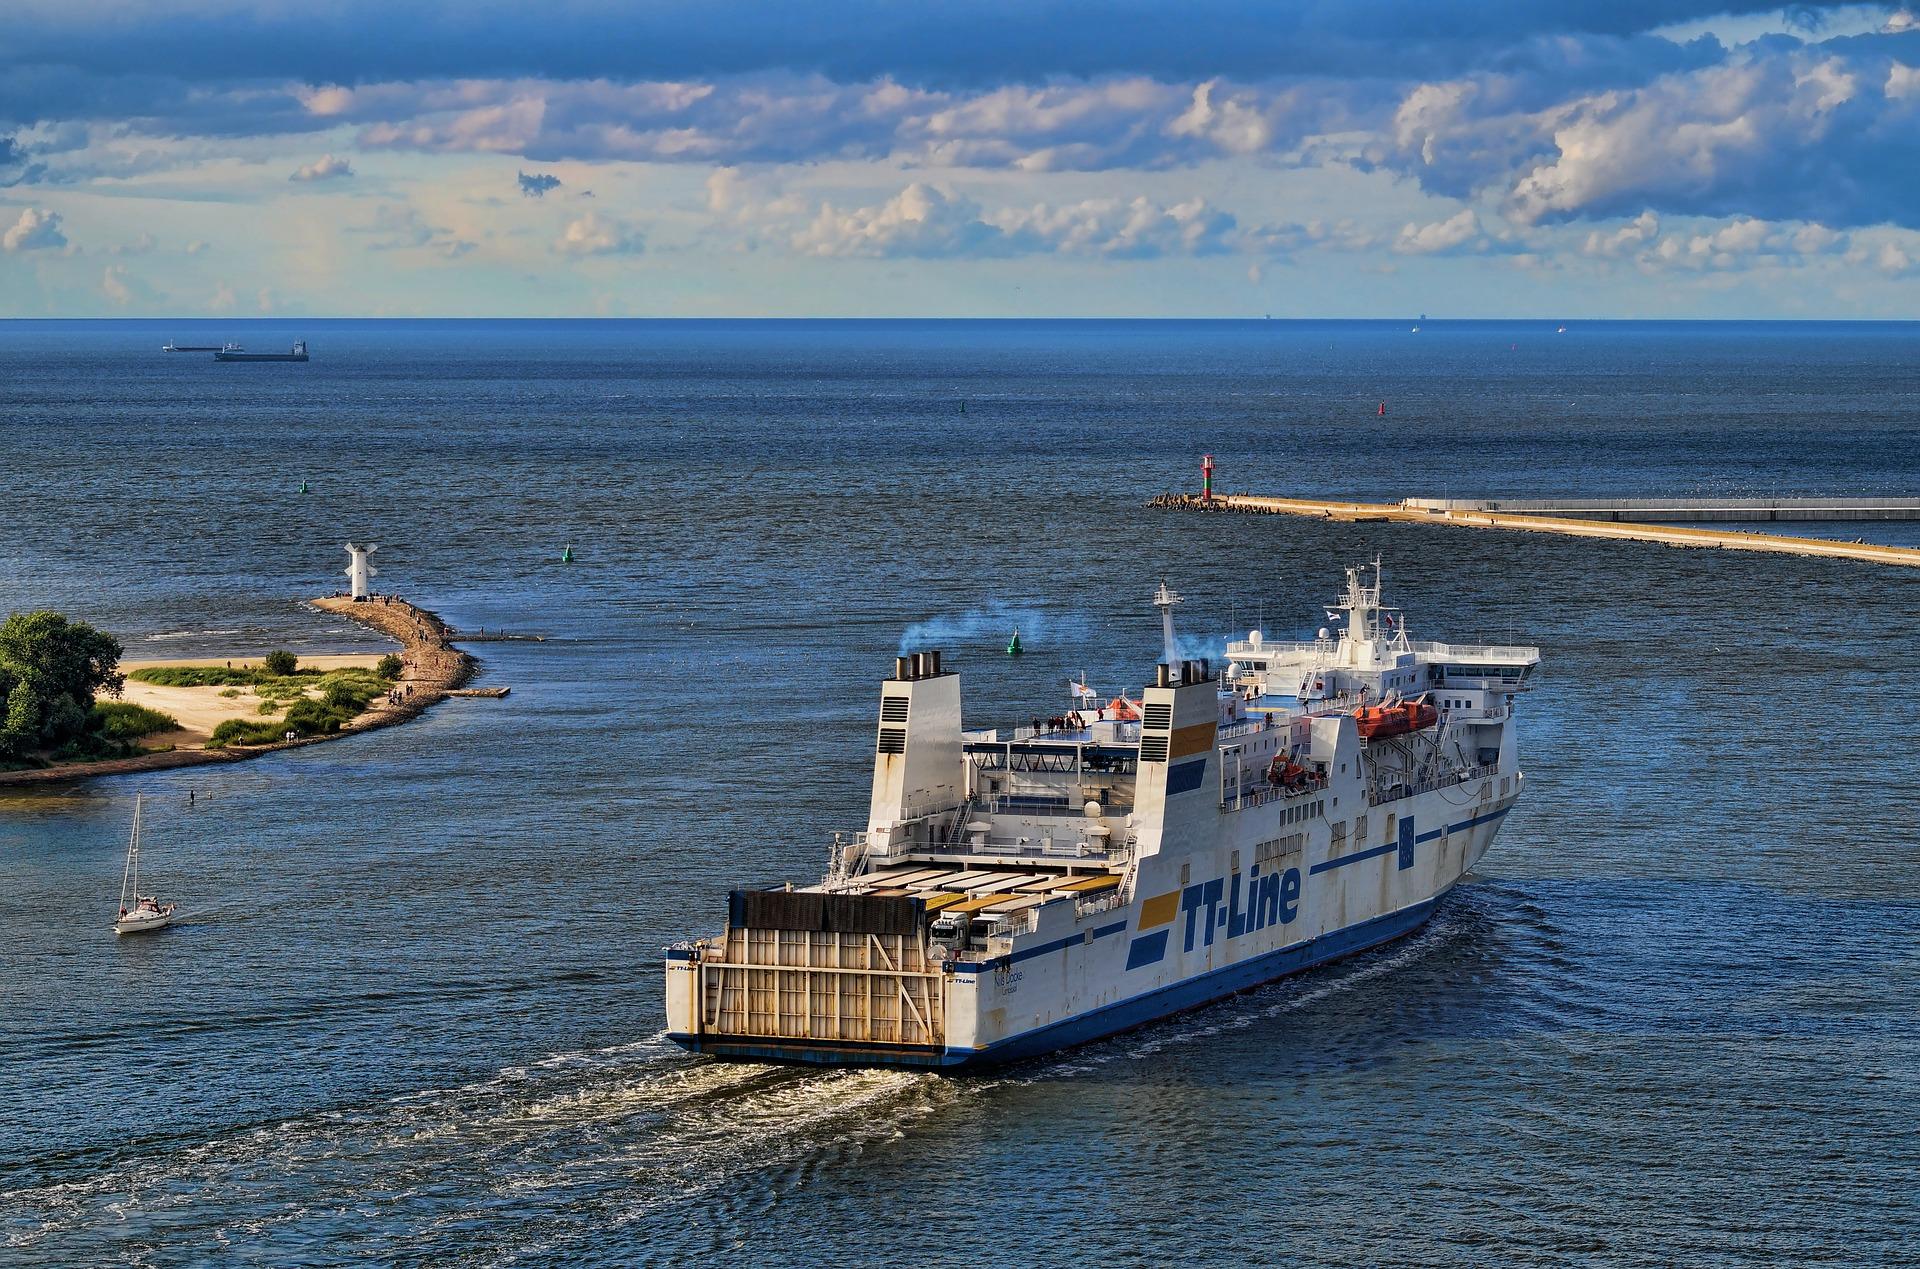 ferry-2028373_1920